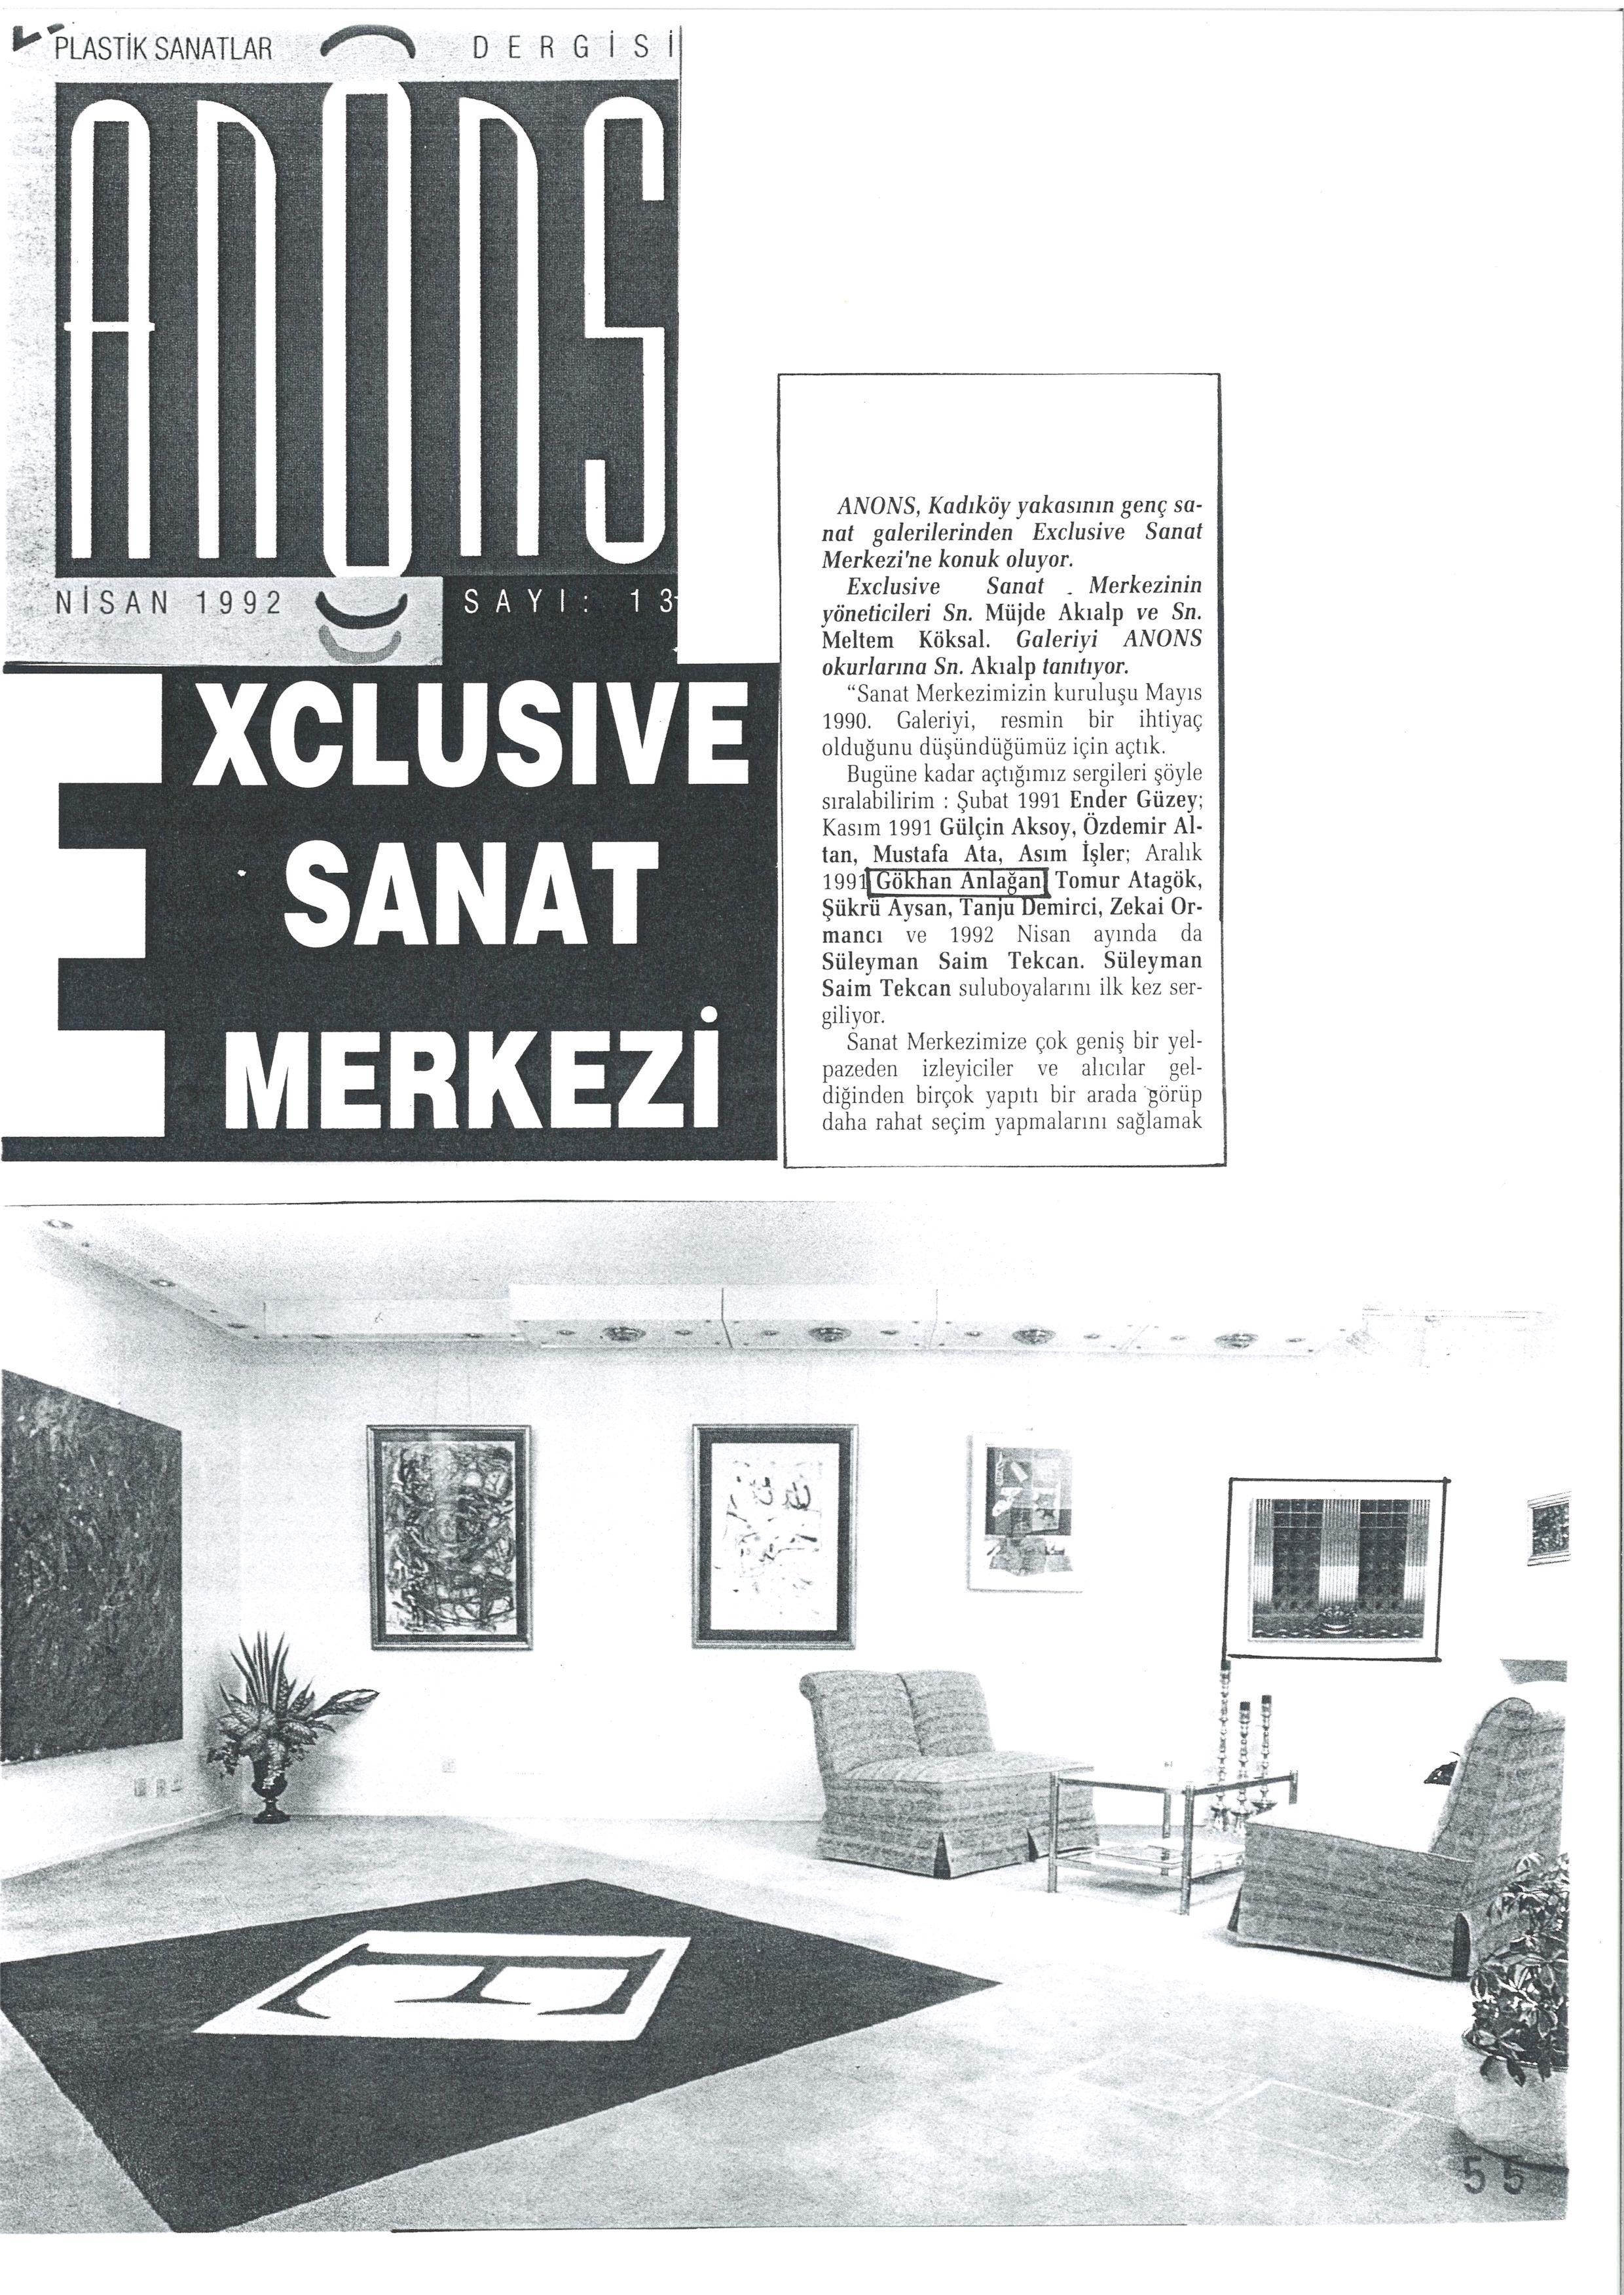 Anons nisan 1992